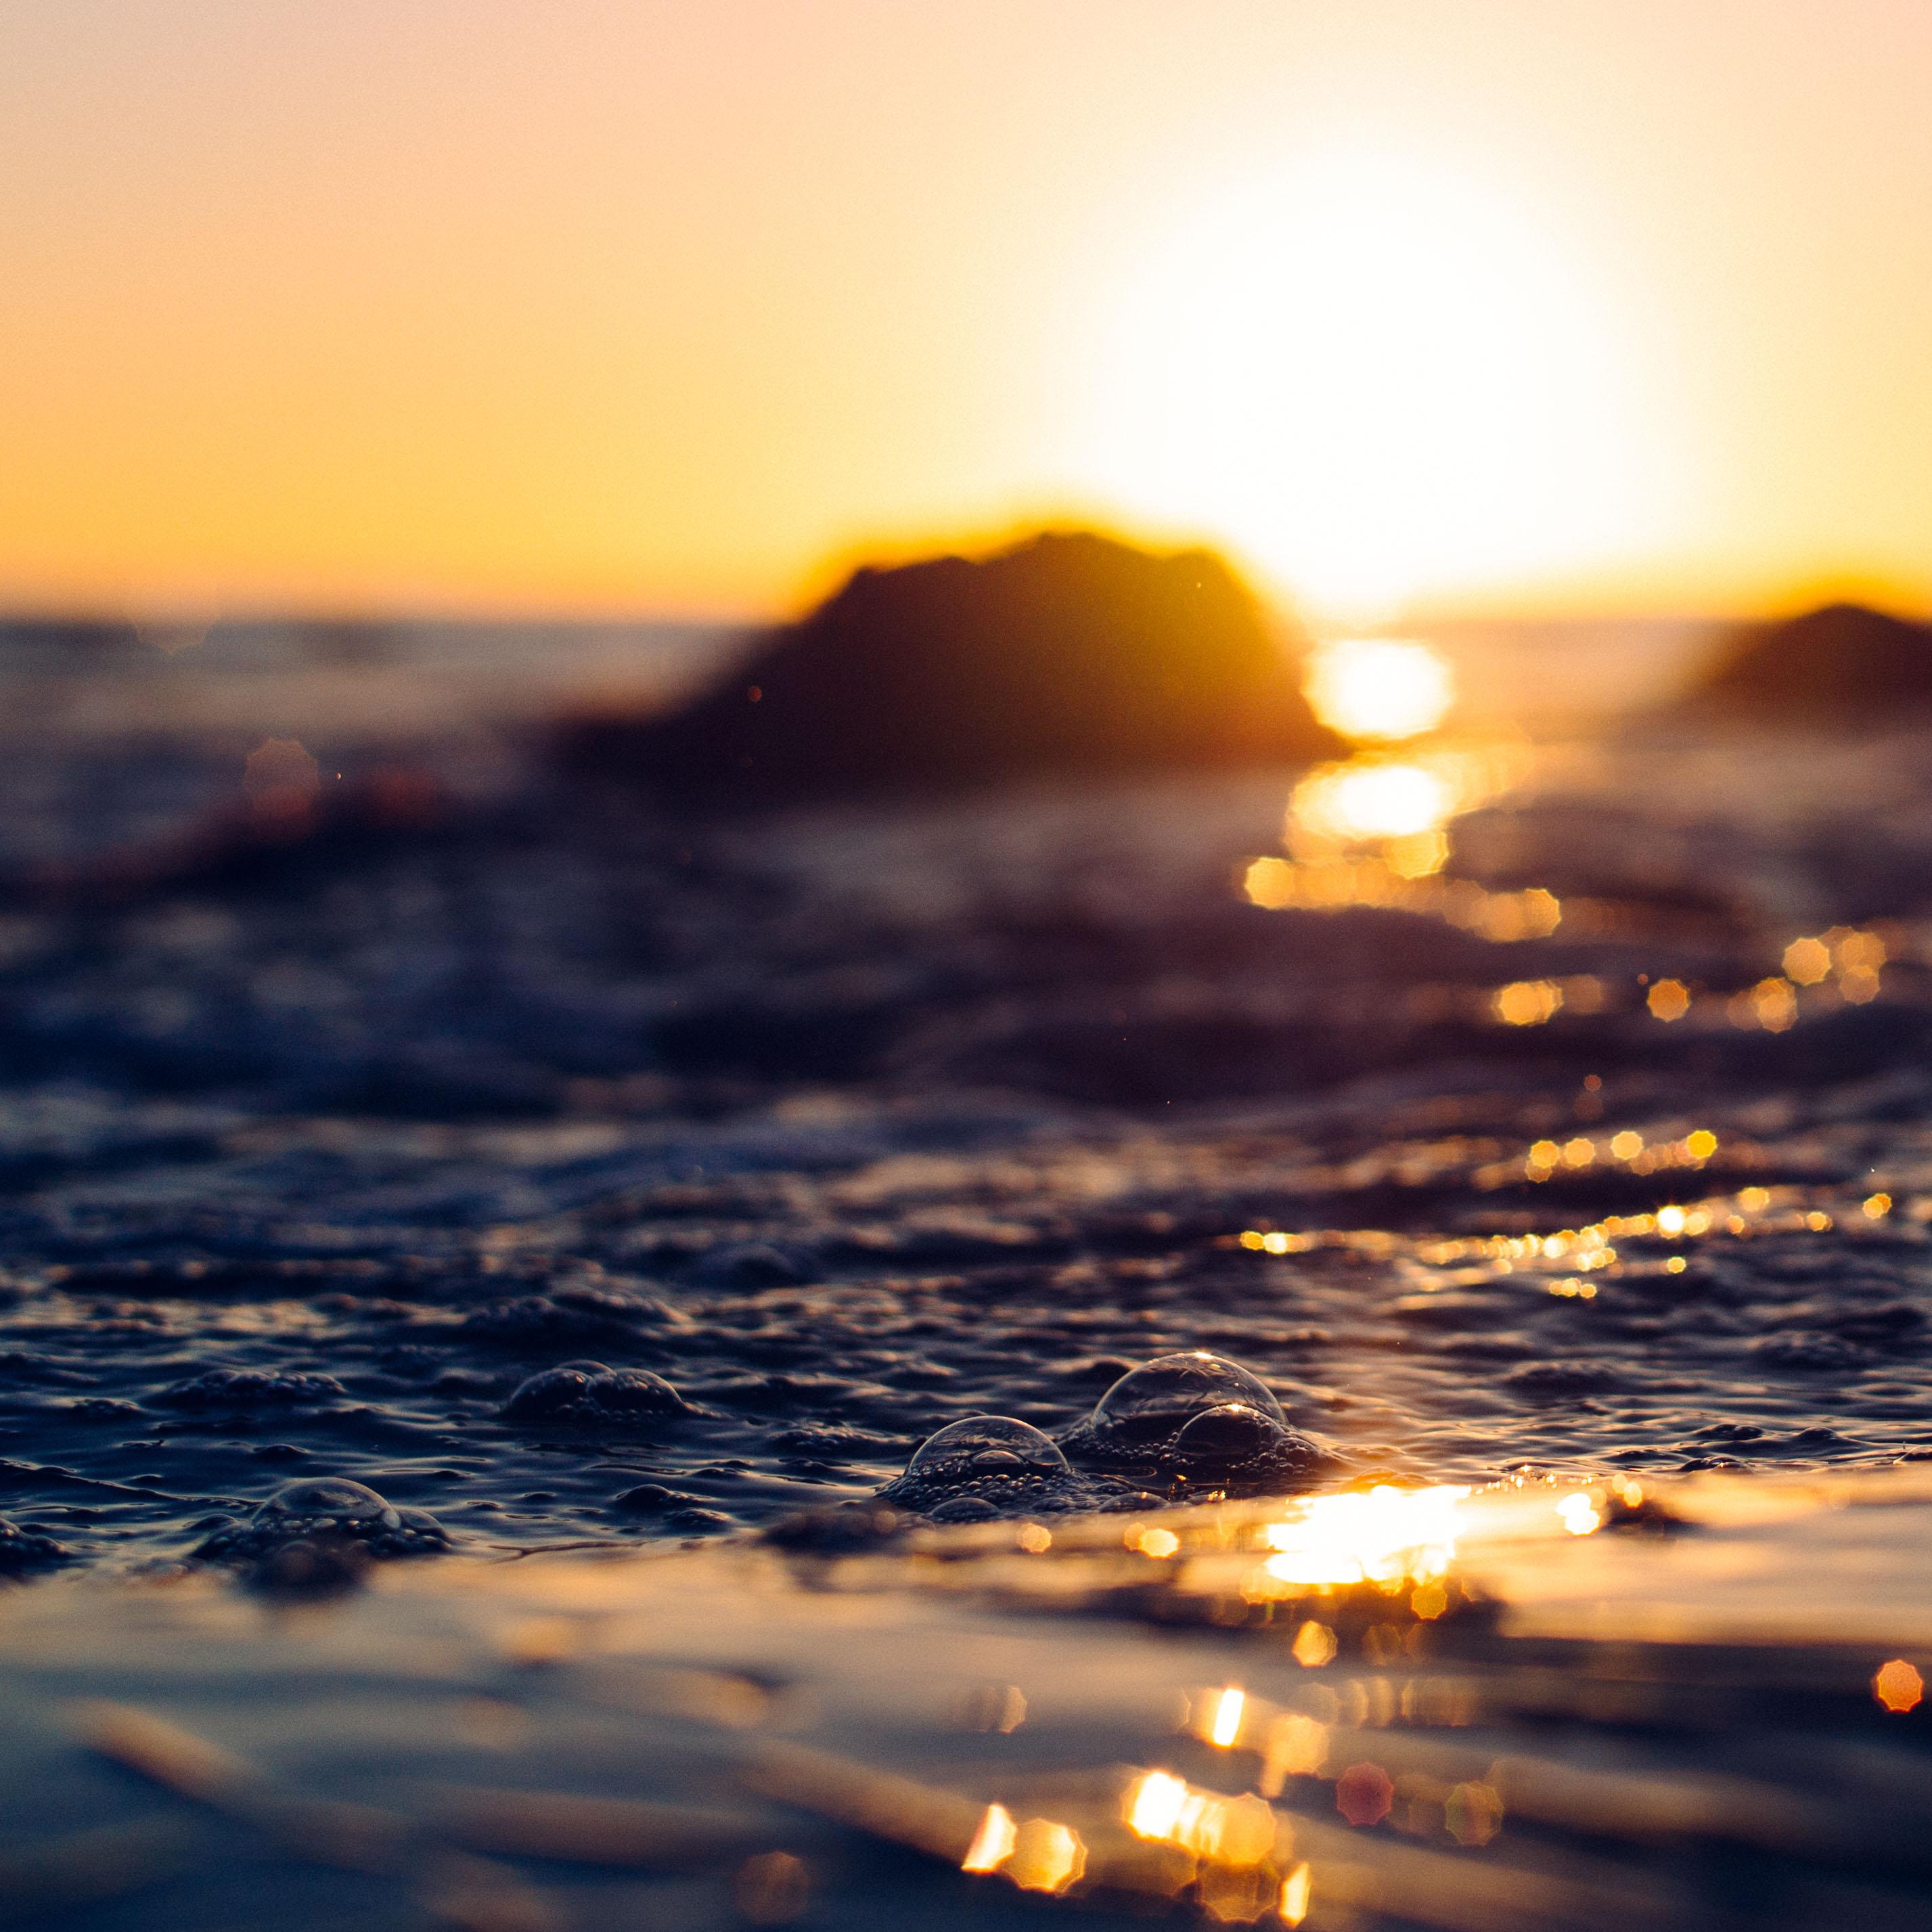 shell_beach-3